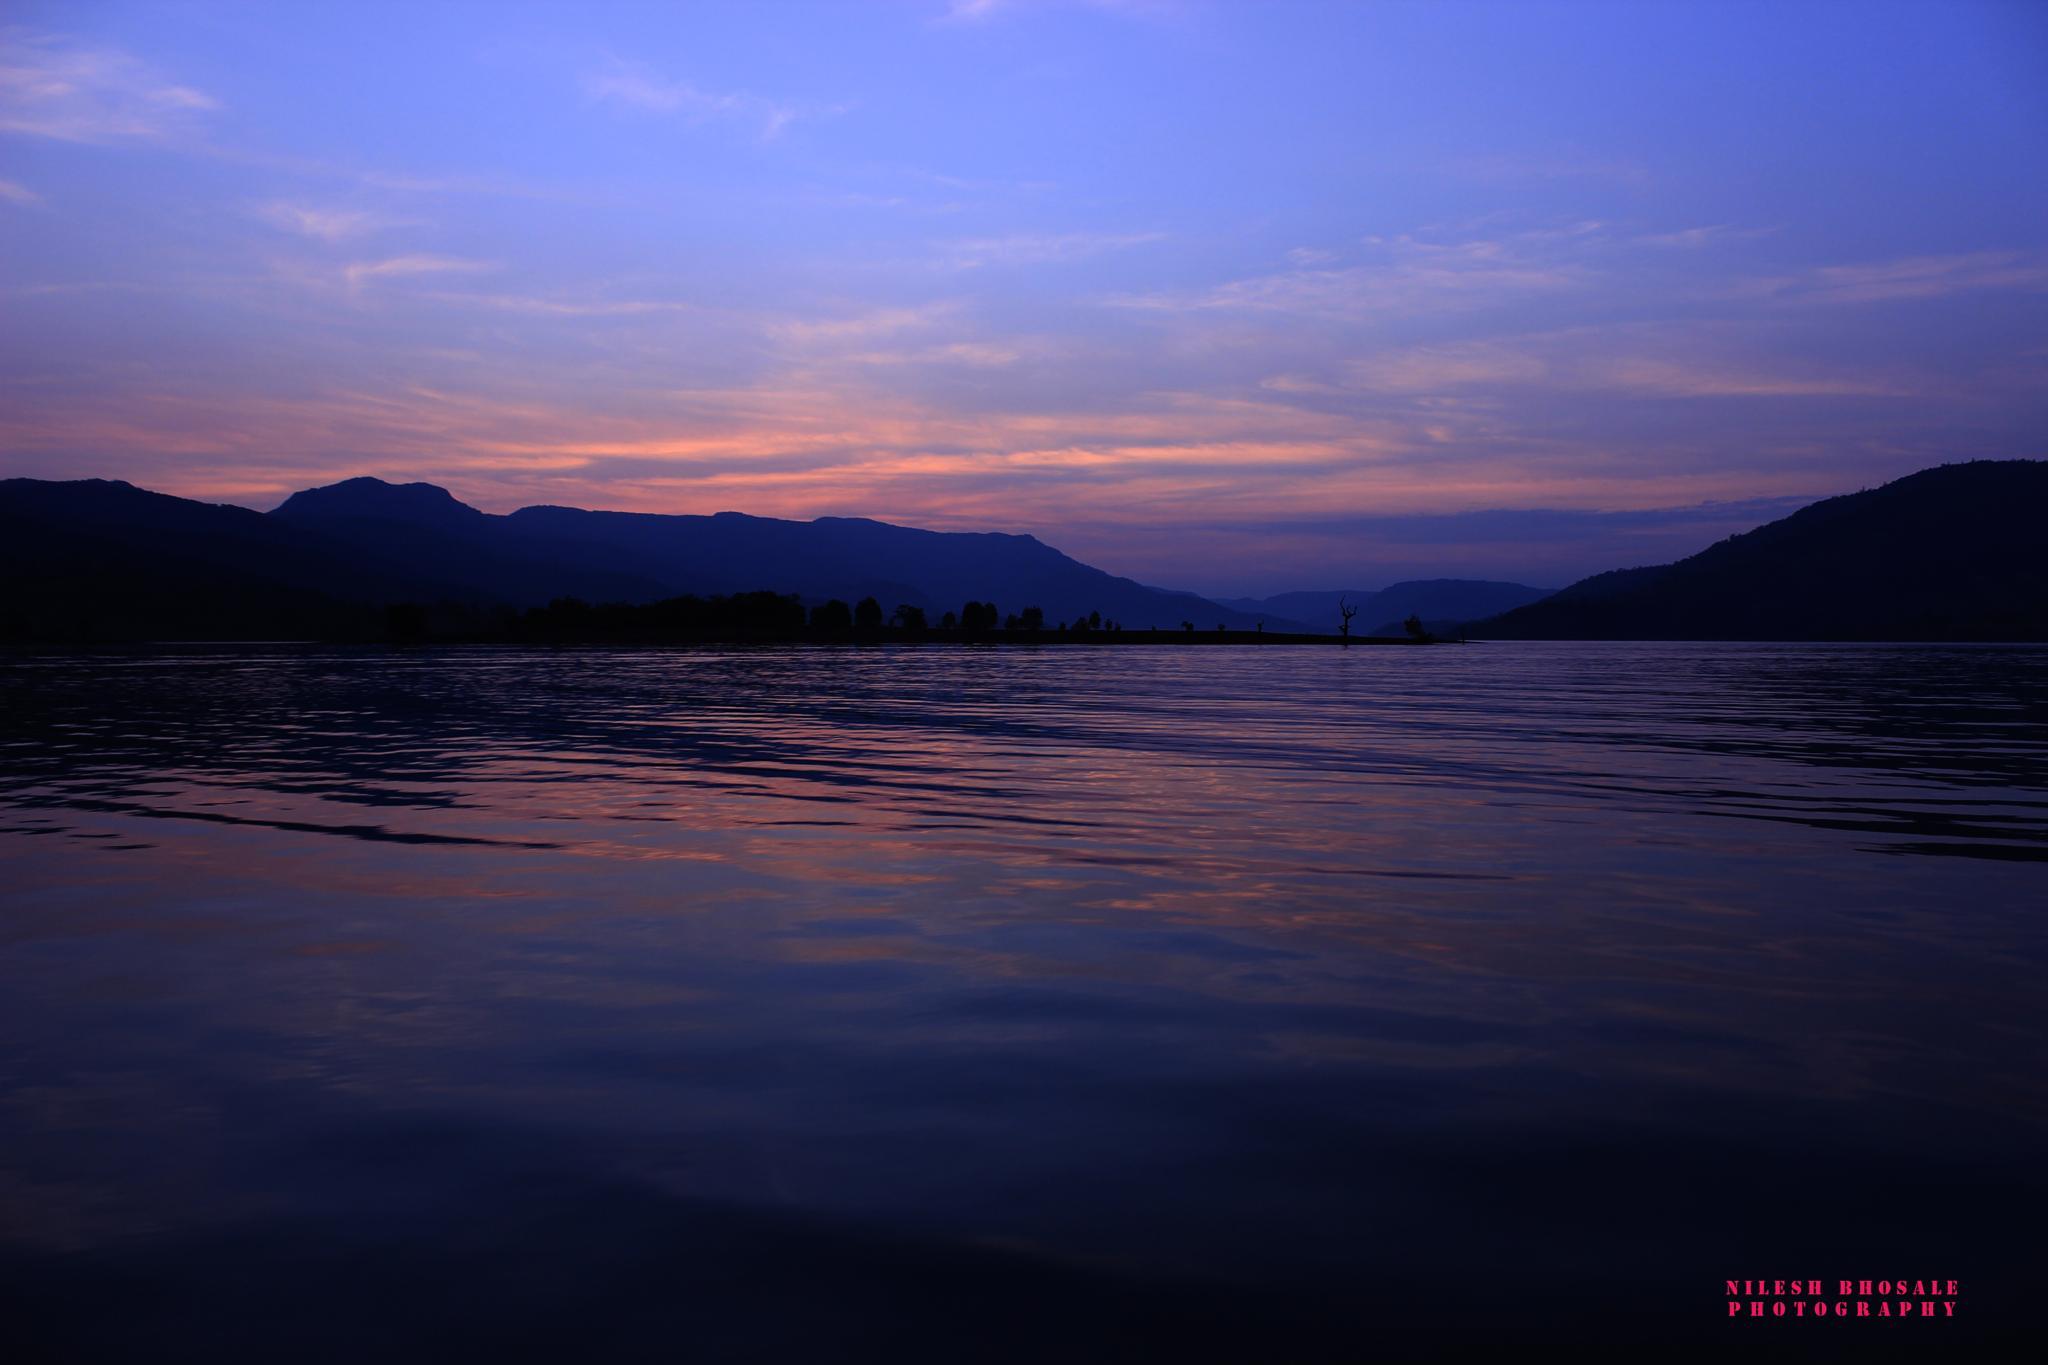 Evening by Nilesh Bhosale